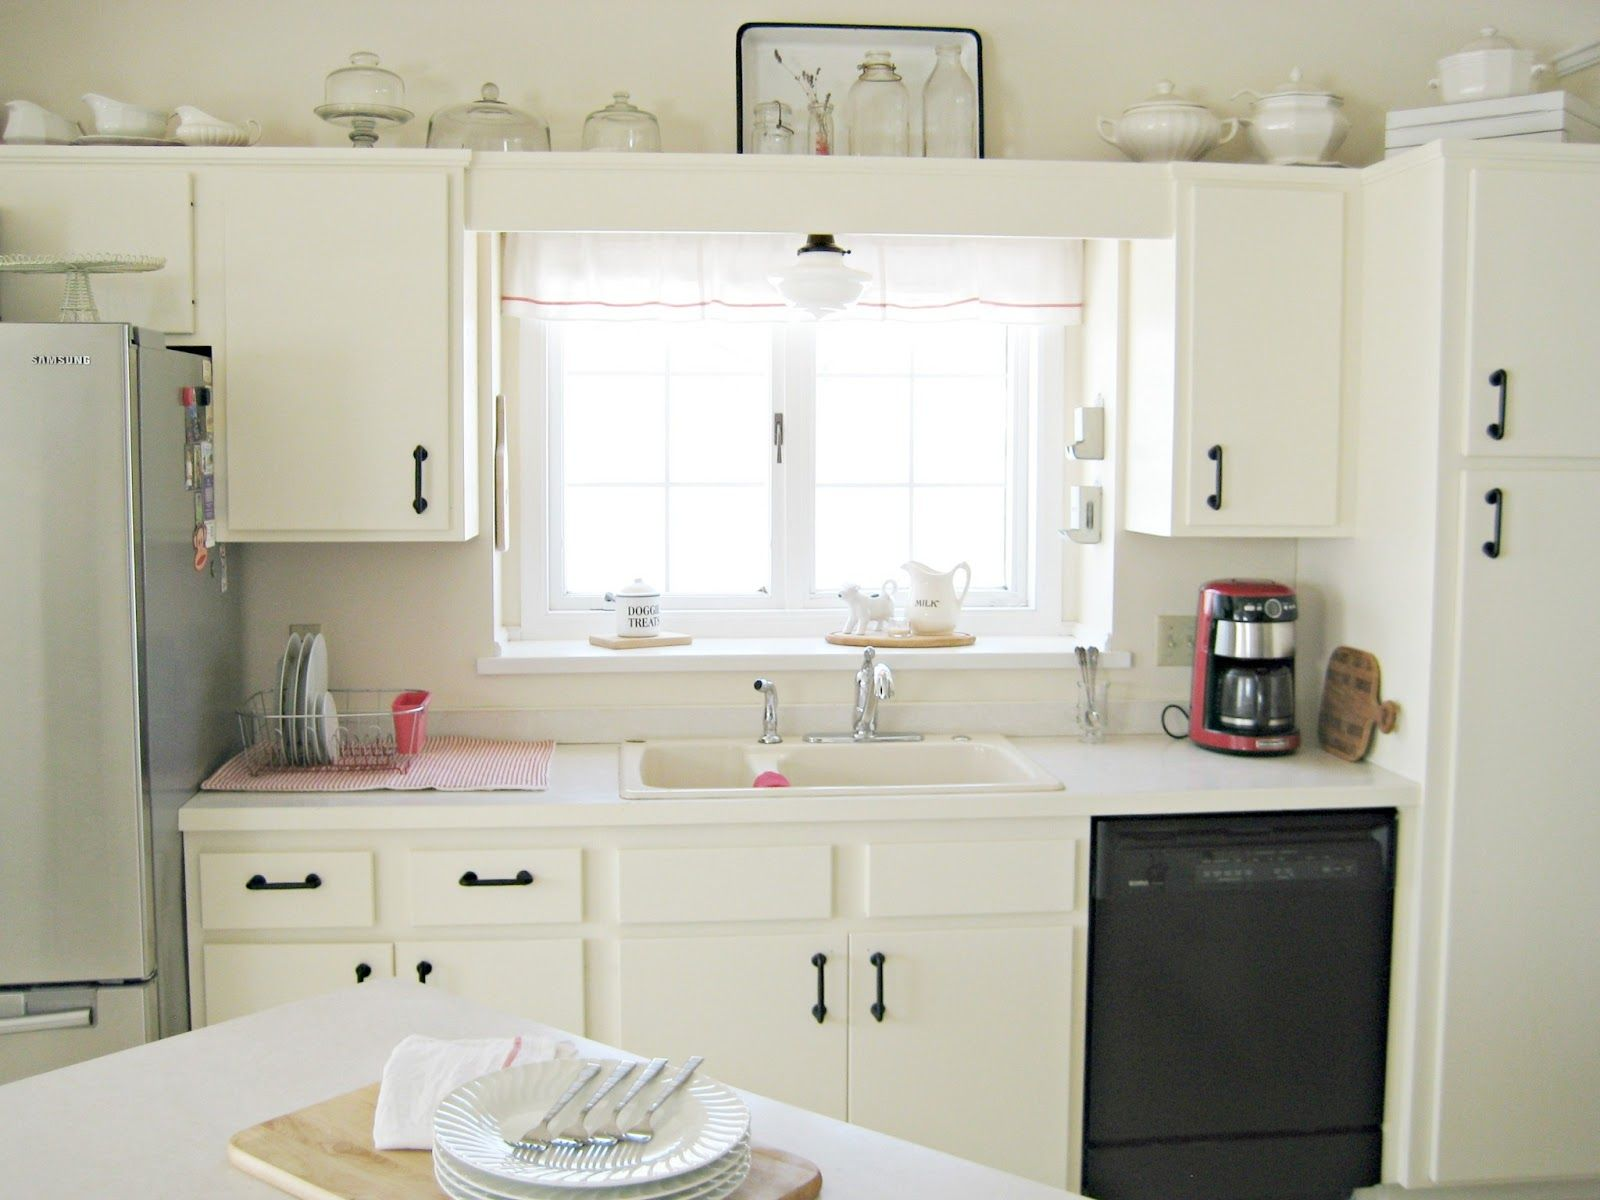 Kitchen wonderful pendant lighting over sink kitchen with